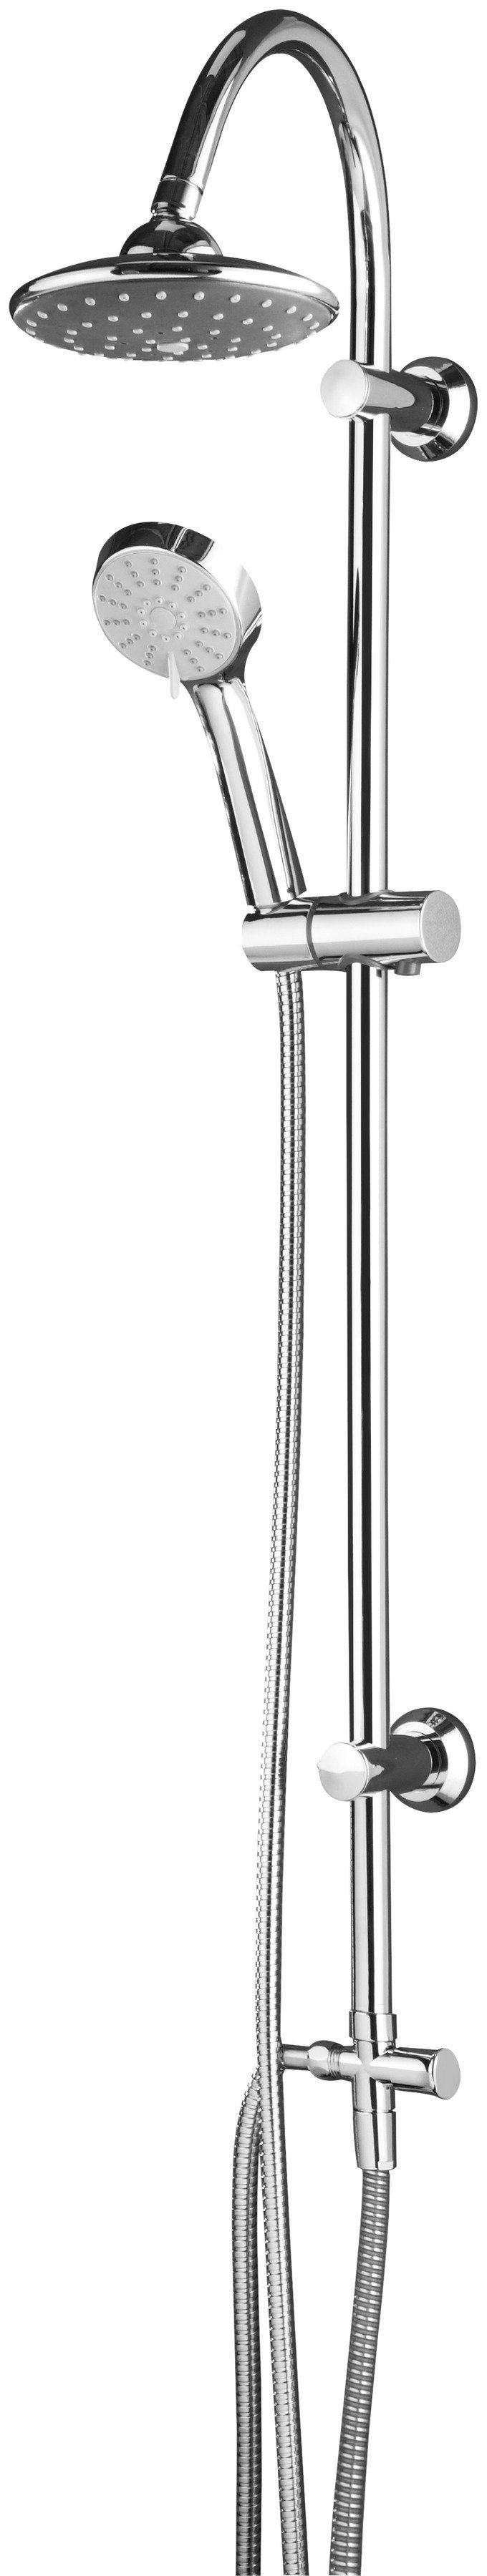 Überkopfbrause - Set »Ibiza«, Kopfbrause, 15 cm